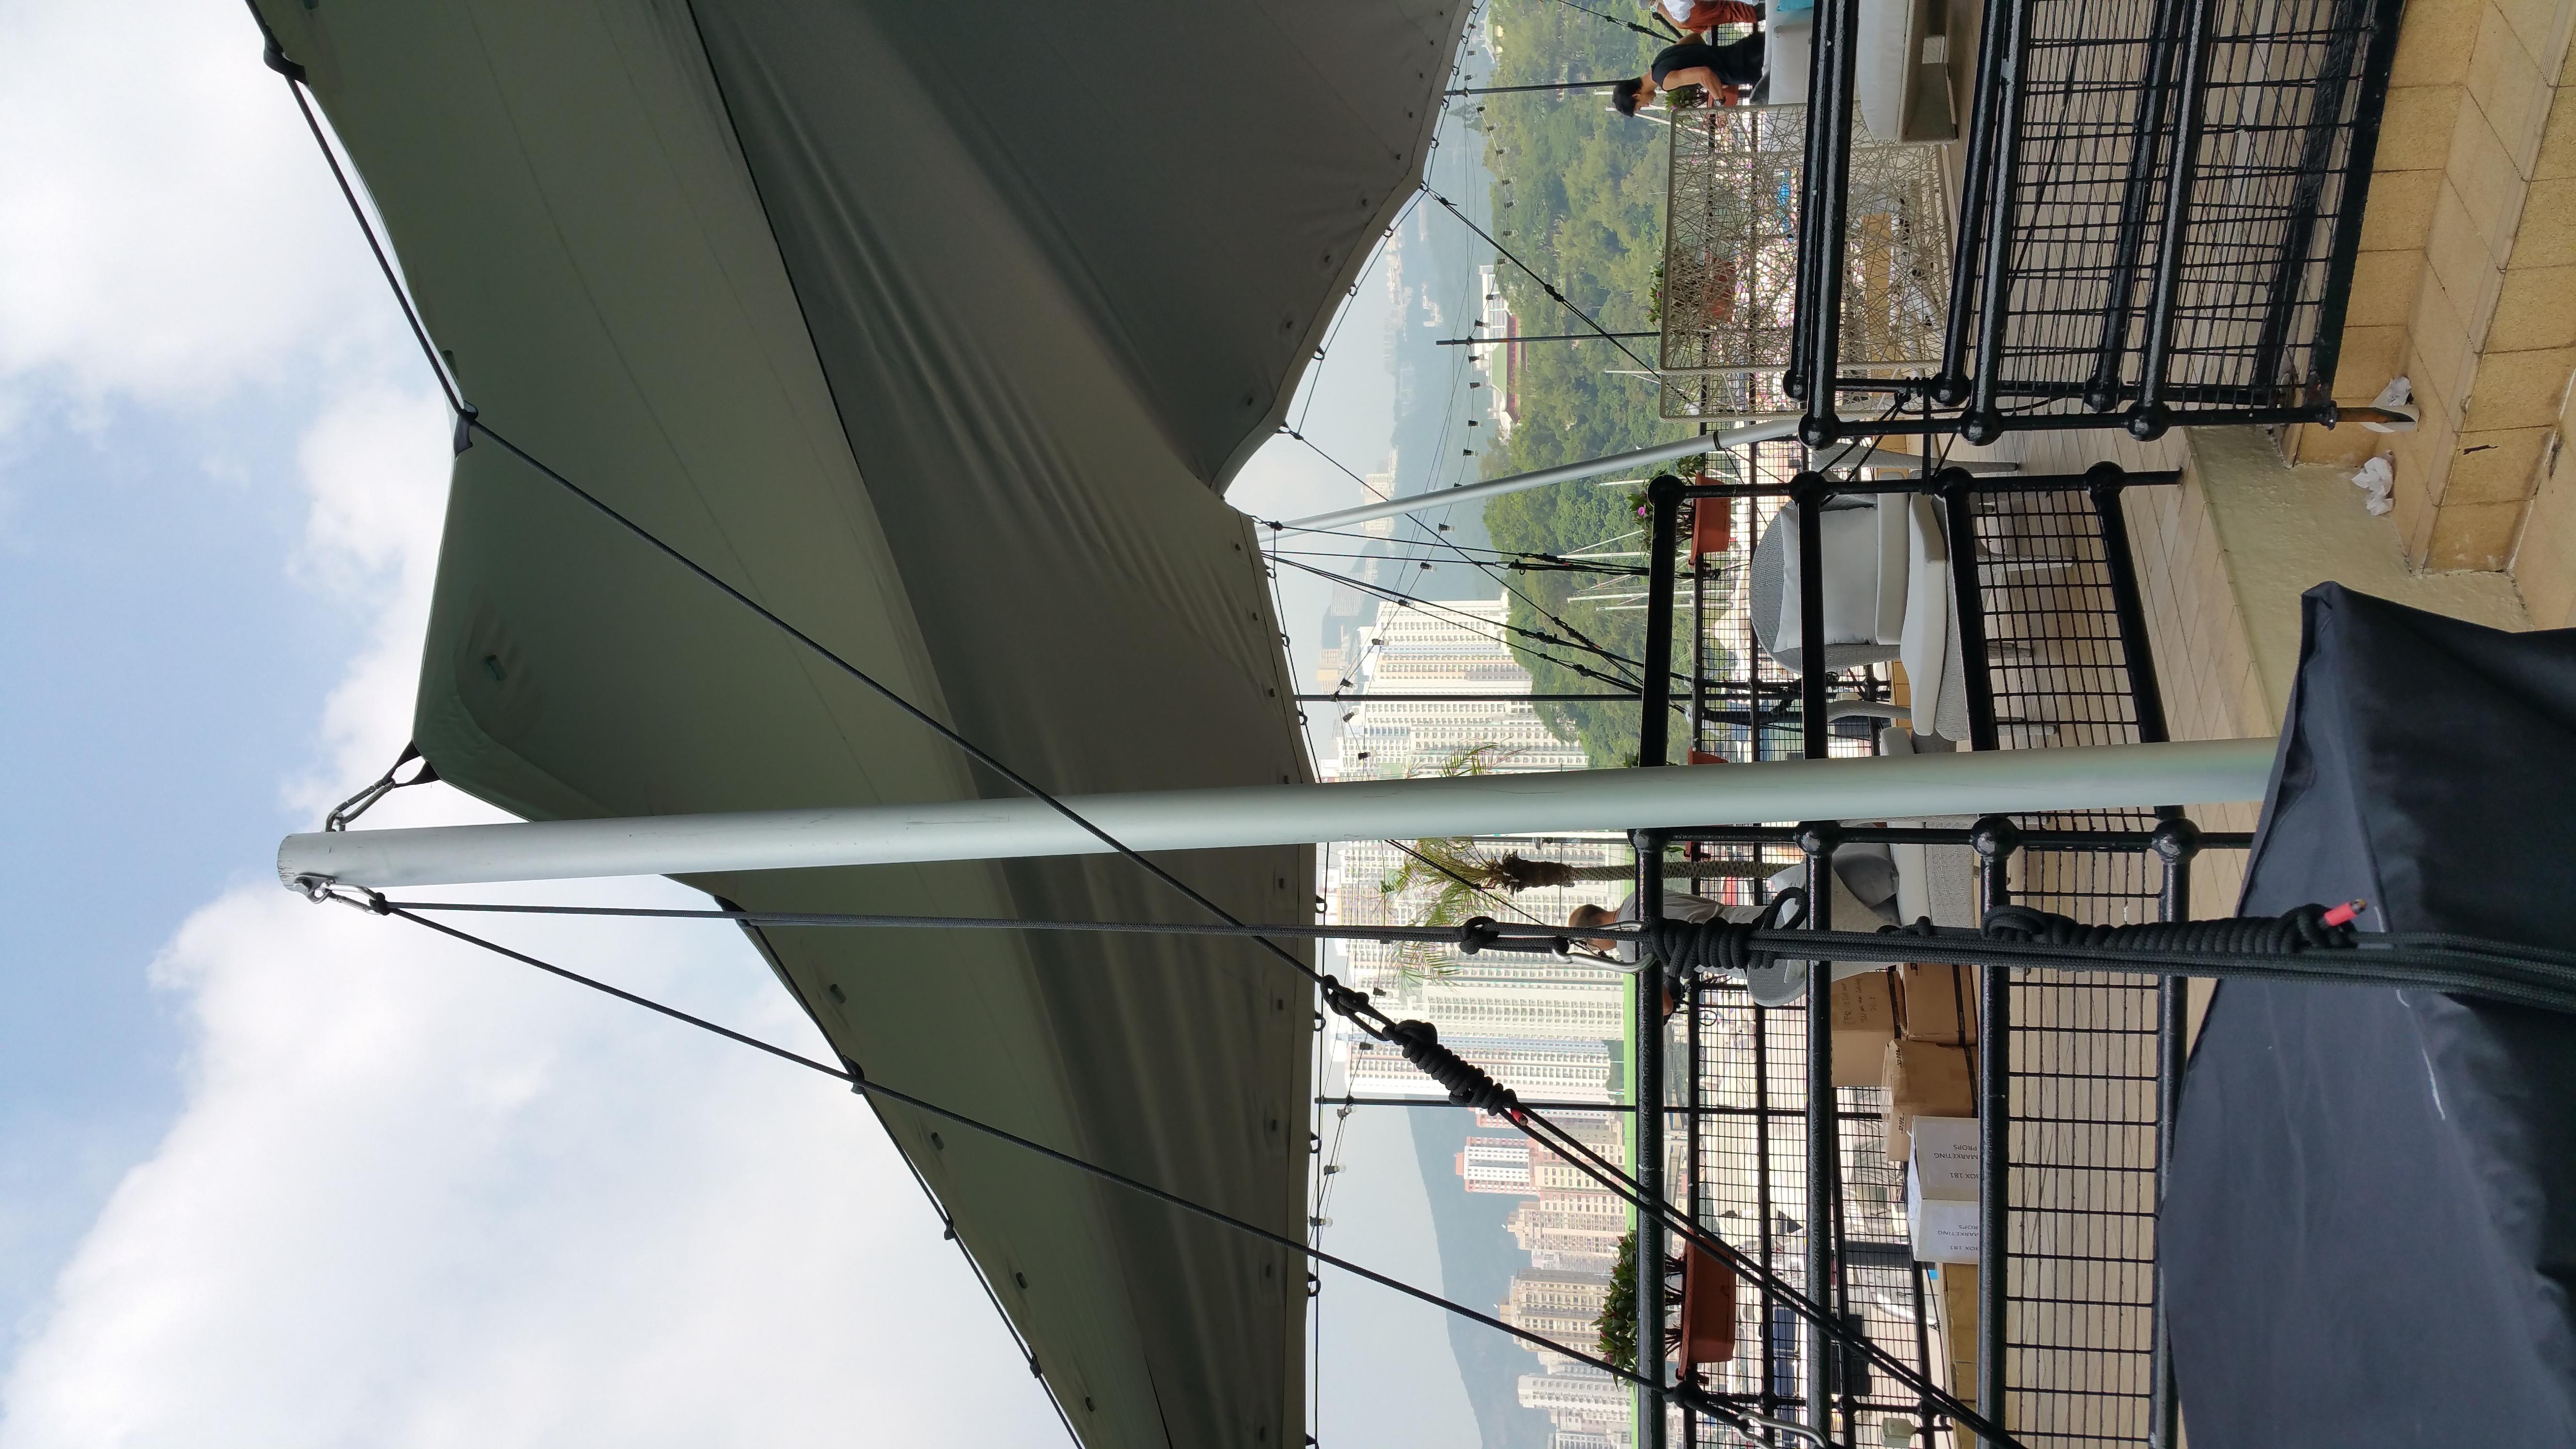 Stretch Tent Aberdeen Boat Club 3